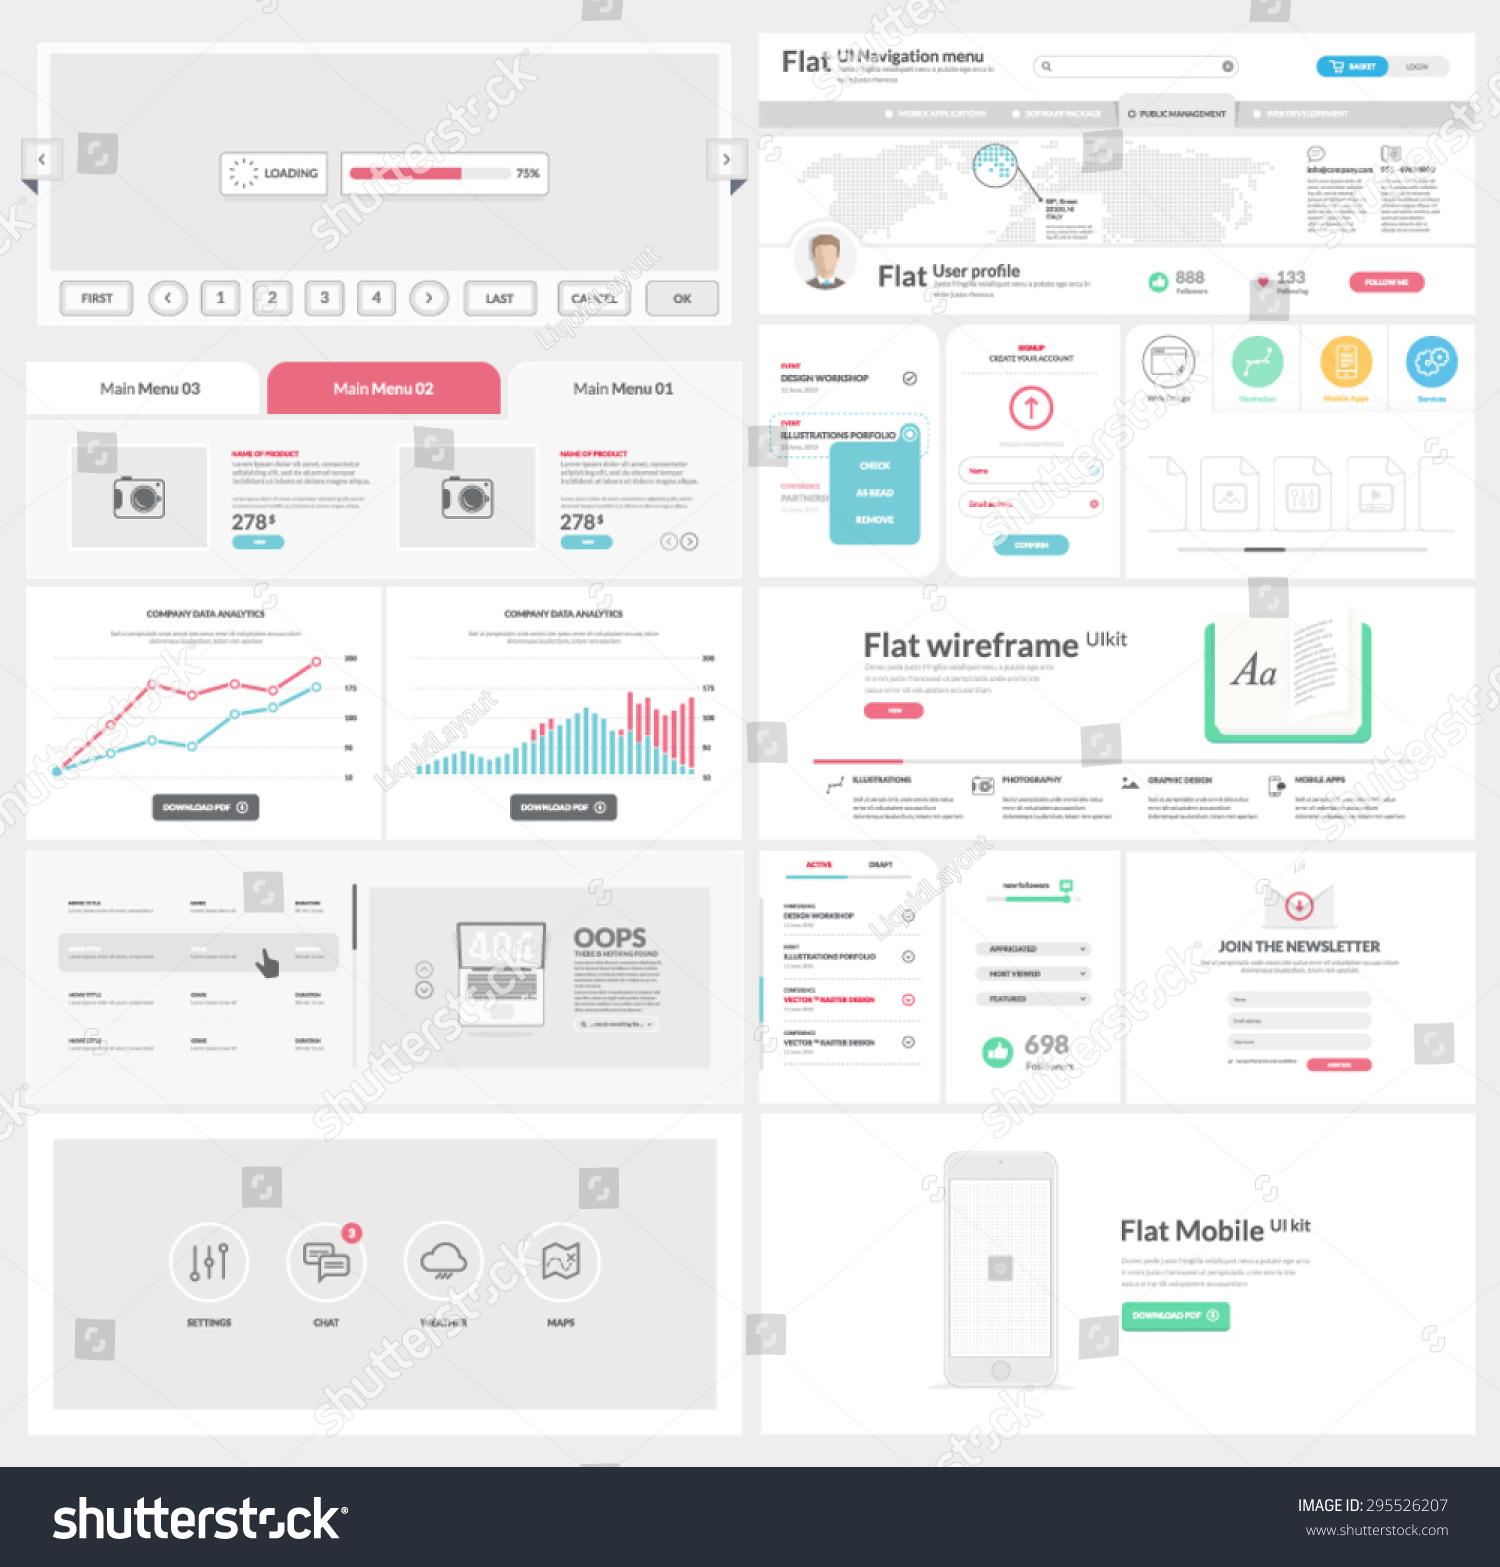 Flat Ui Kit Template Website Mobile Stock Vector 295526207 ...